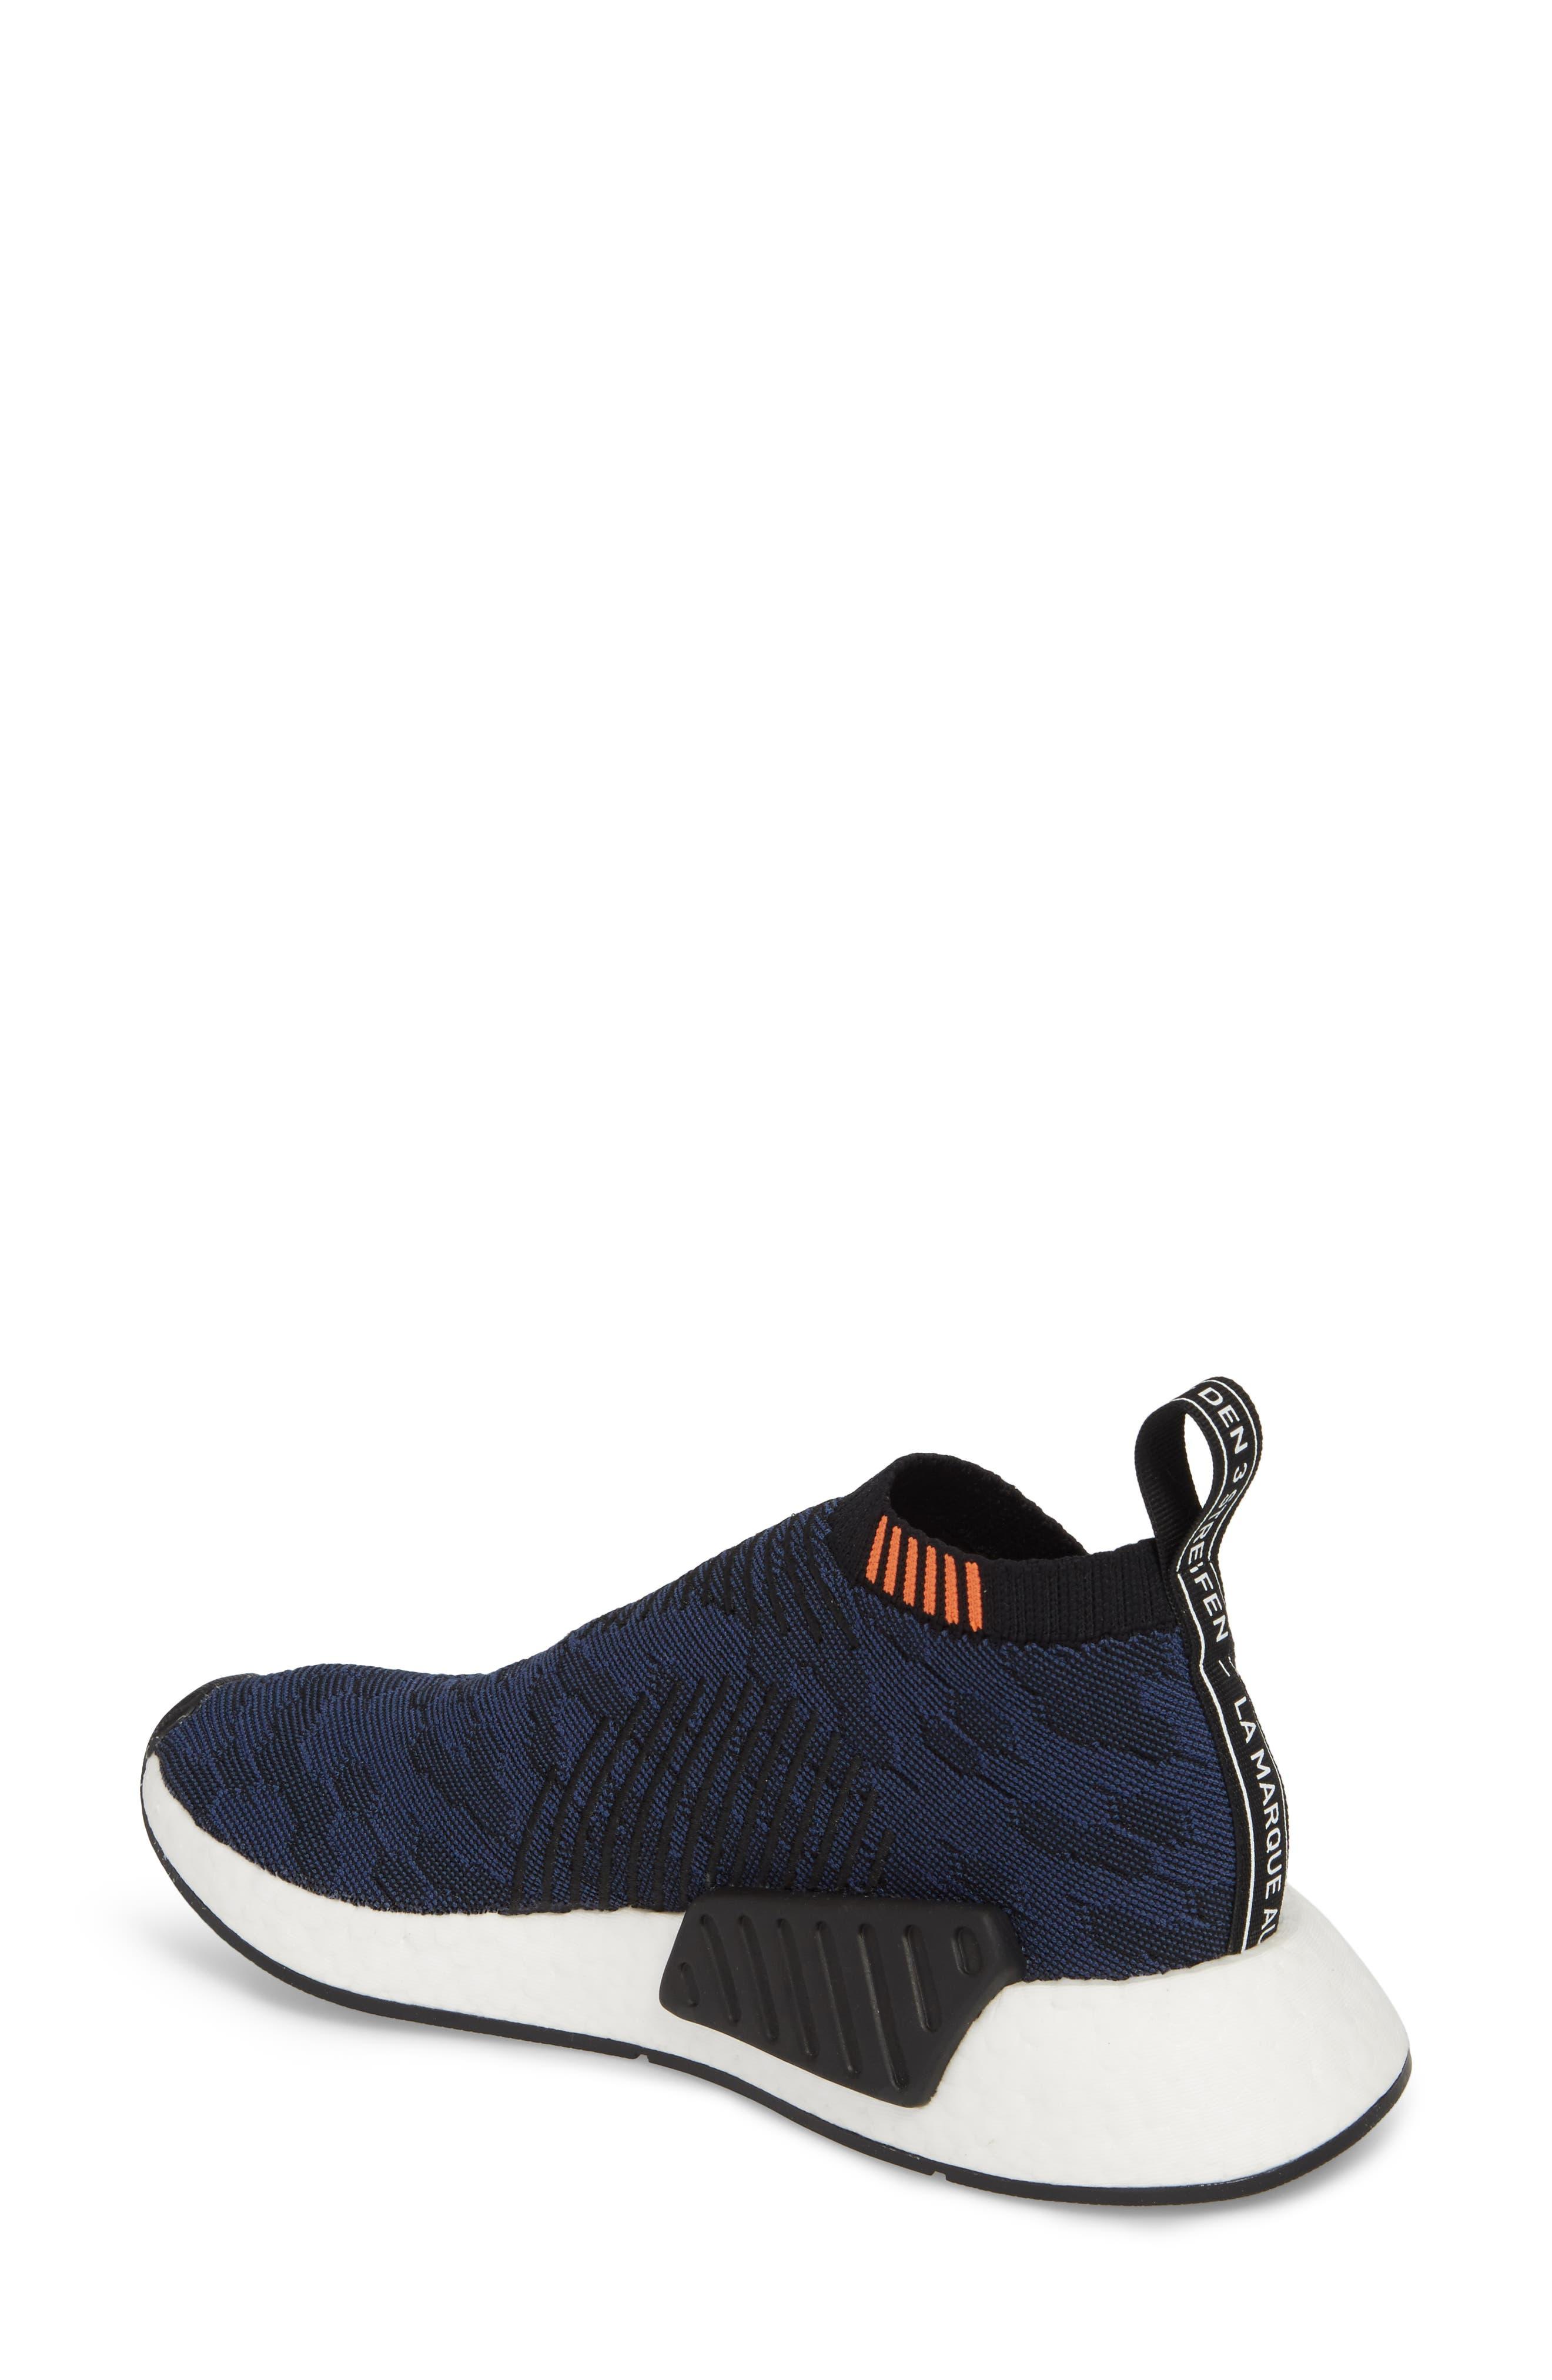 NMD CS2 Primeknit Sneaker,                             Alternate thumbnail 2, color,                             Core Black/ Noble Indigo